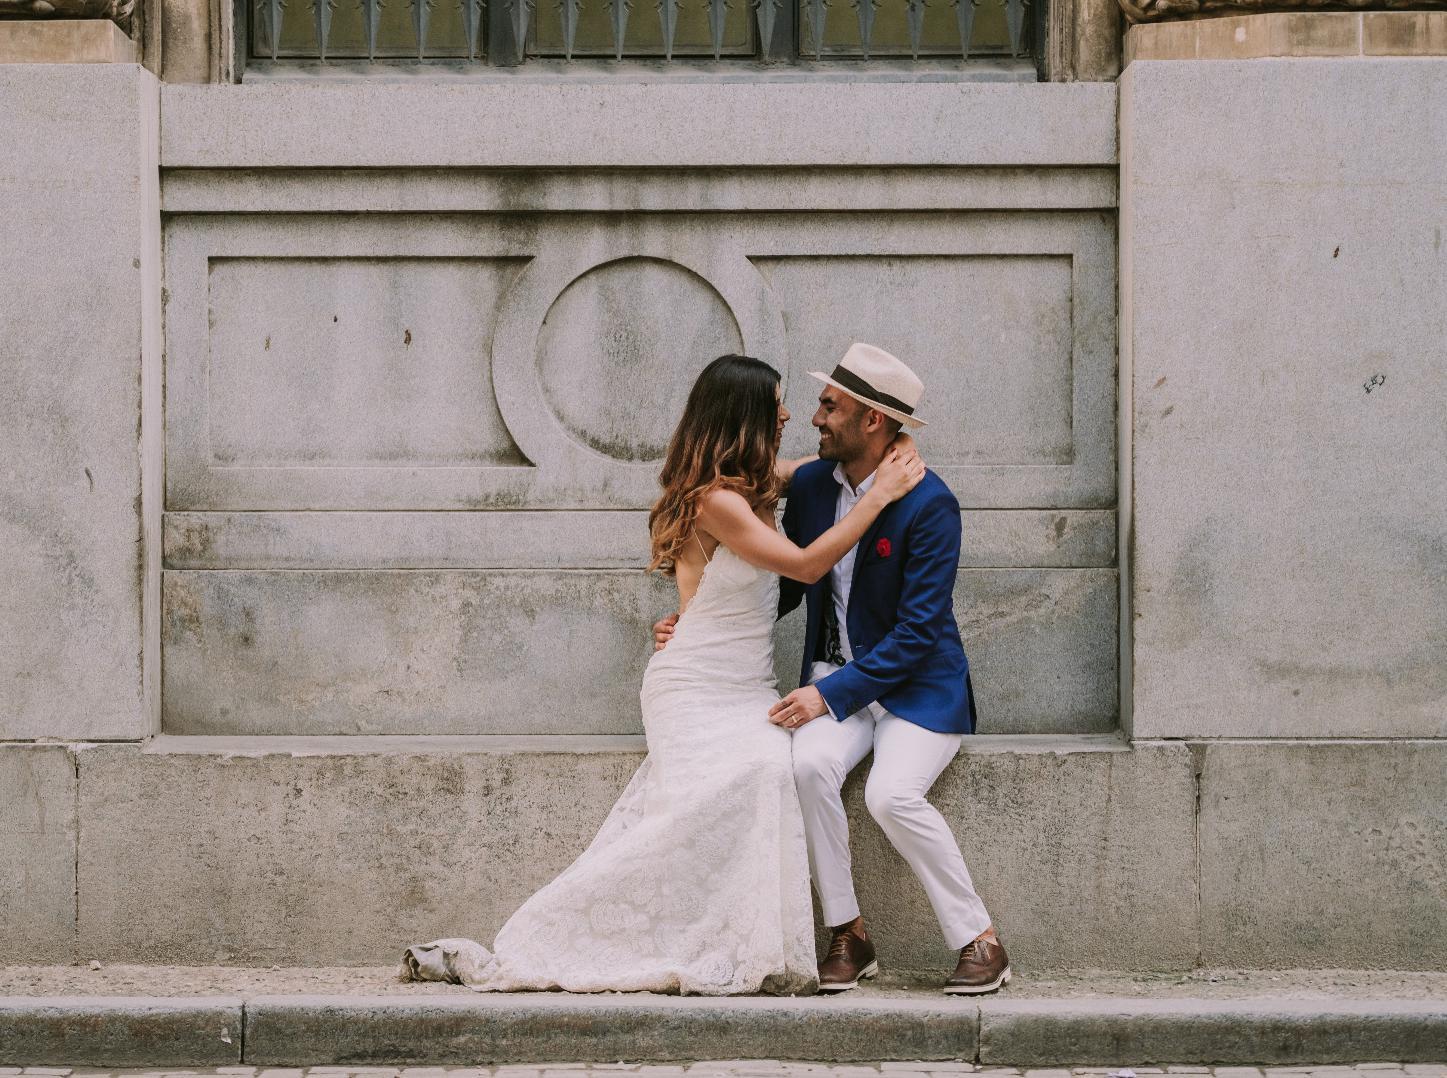 weddings-sin-clasificar-no-theme-cuba-28851.jpg